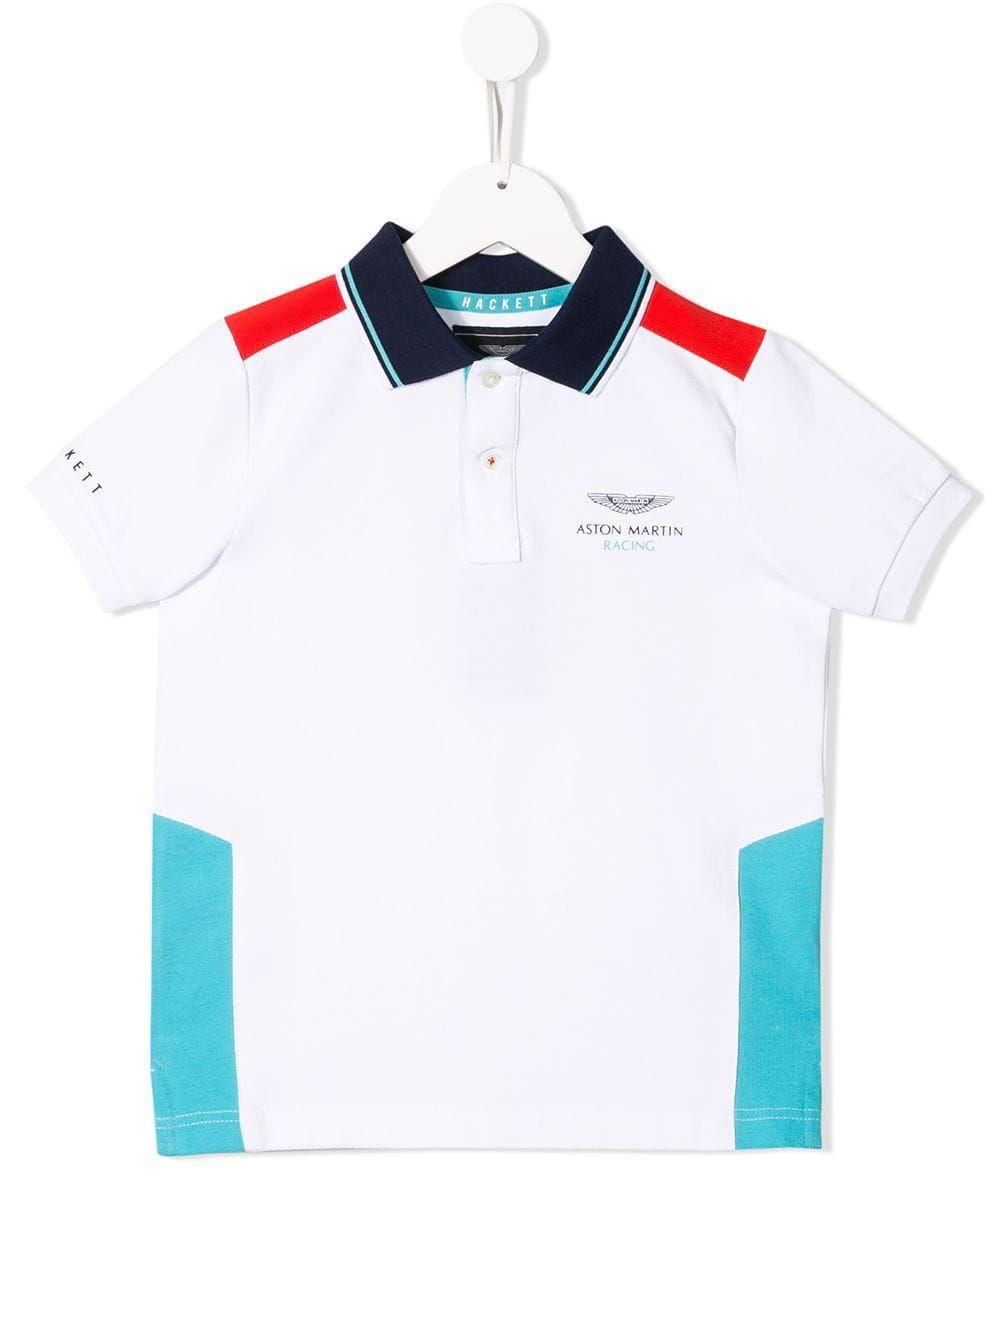 Hackett Kids Aston Martin polo shirt White | Polo shirt